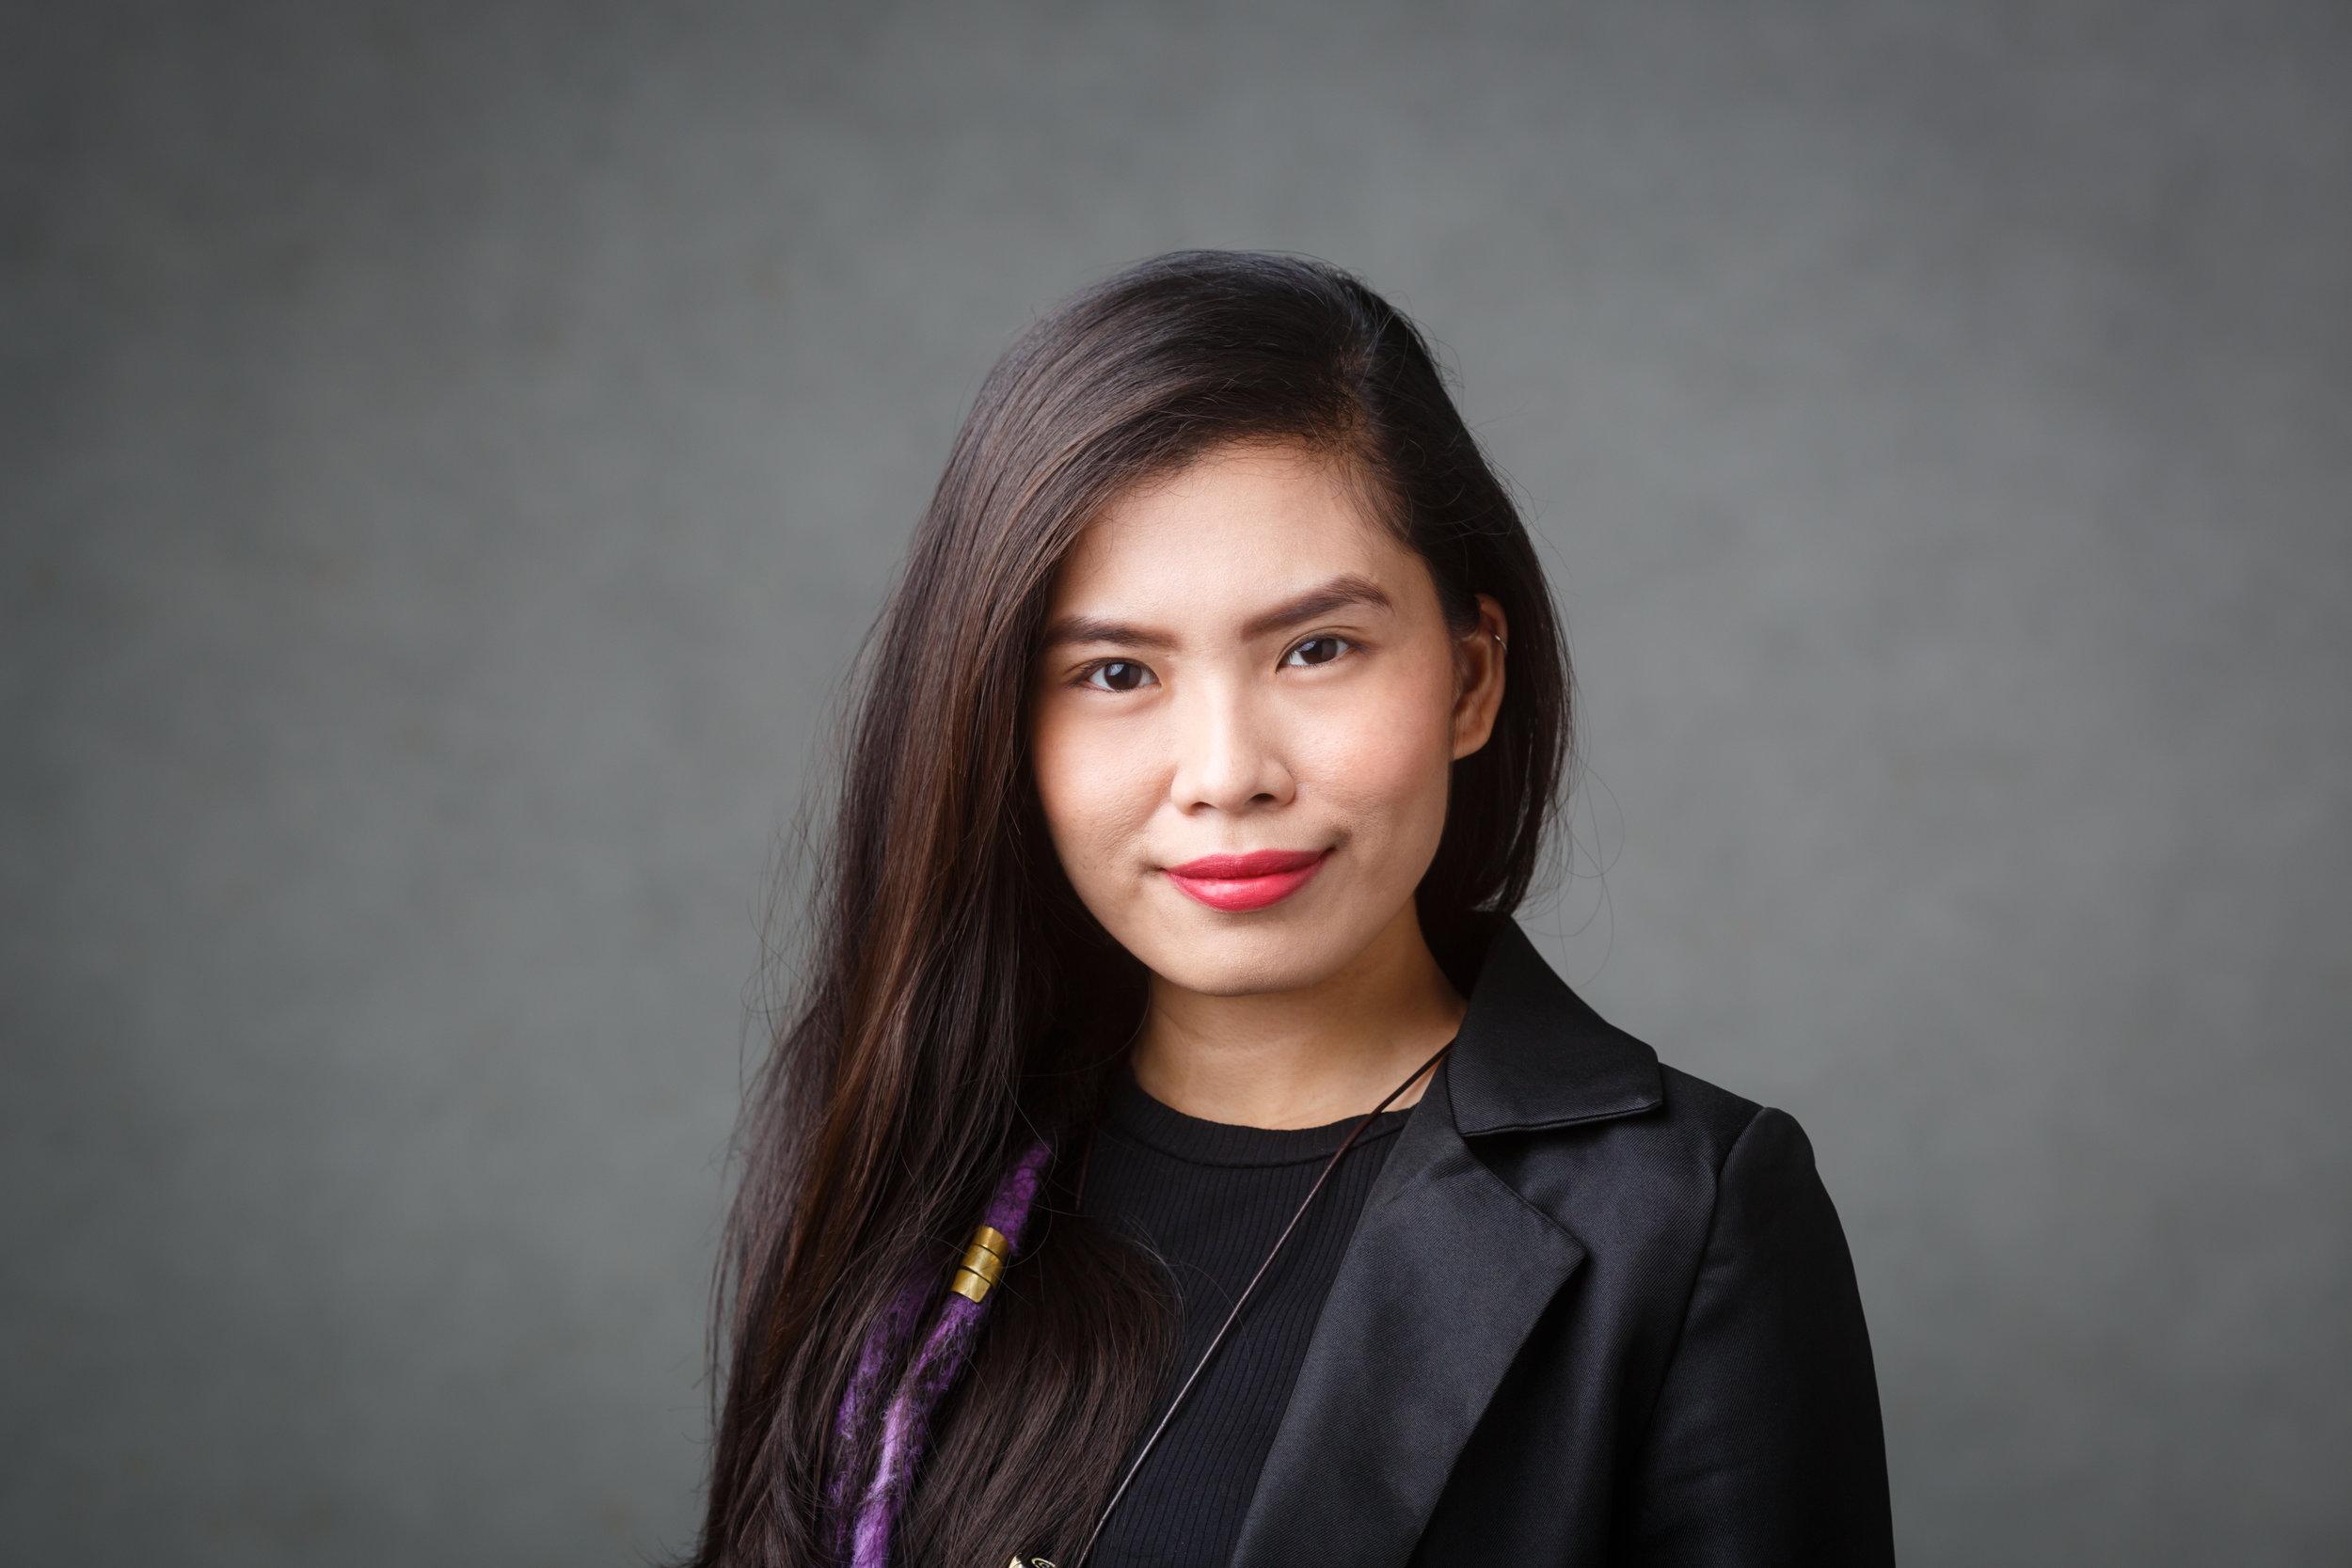 Asyilah mohd bujang - Events / Host / Emcee / Communications